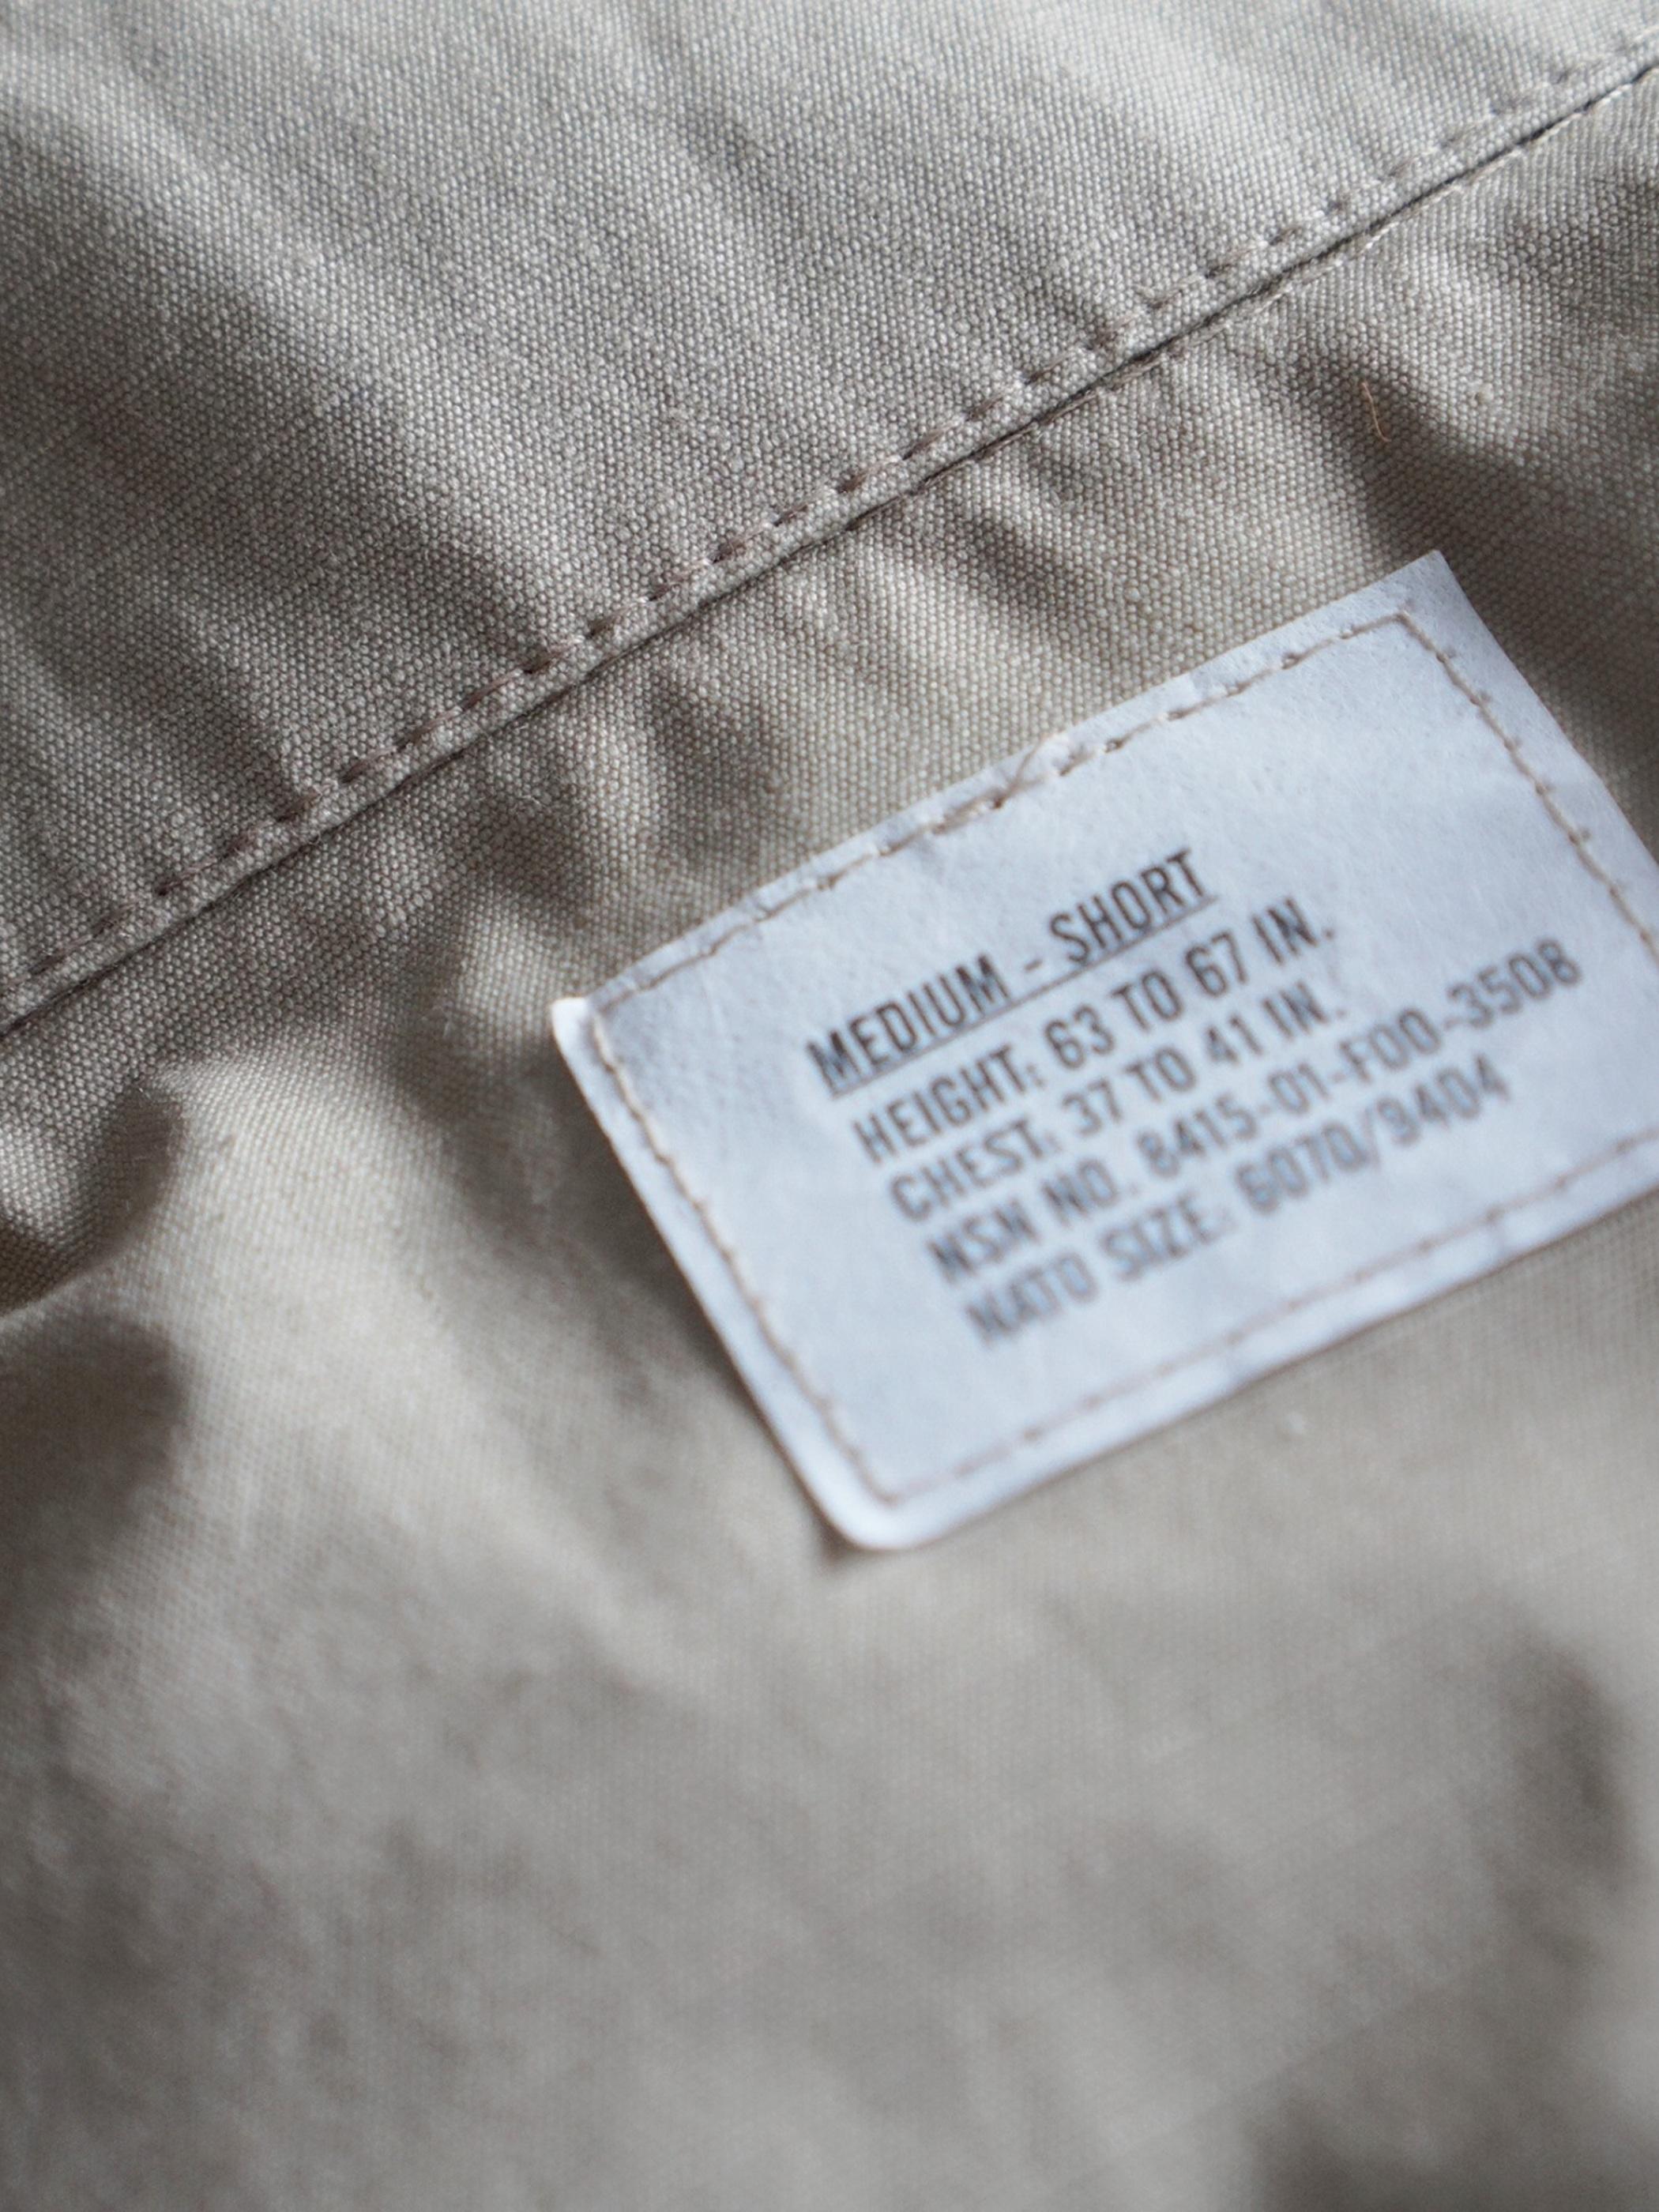 US Military CIVPU(CIVILIAN PROTECTIVE UNIFORM ) Jacket